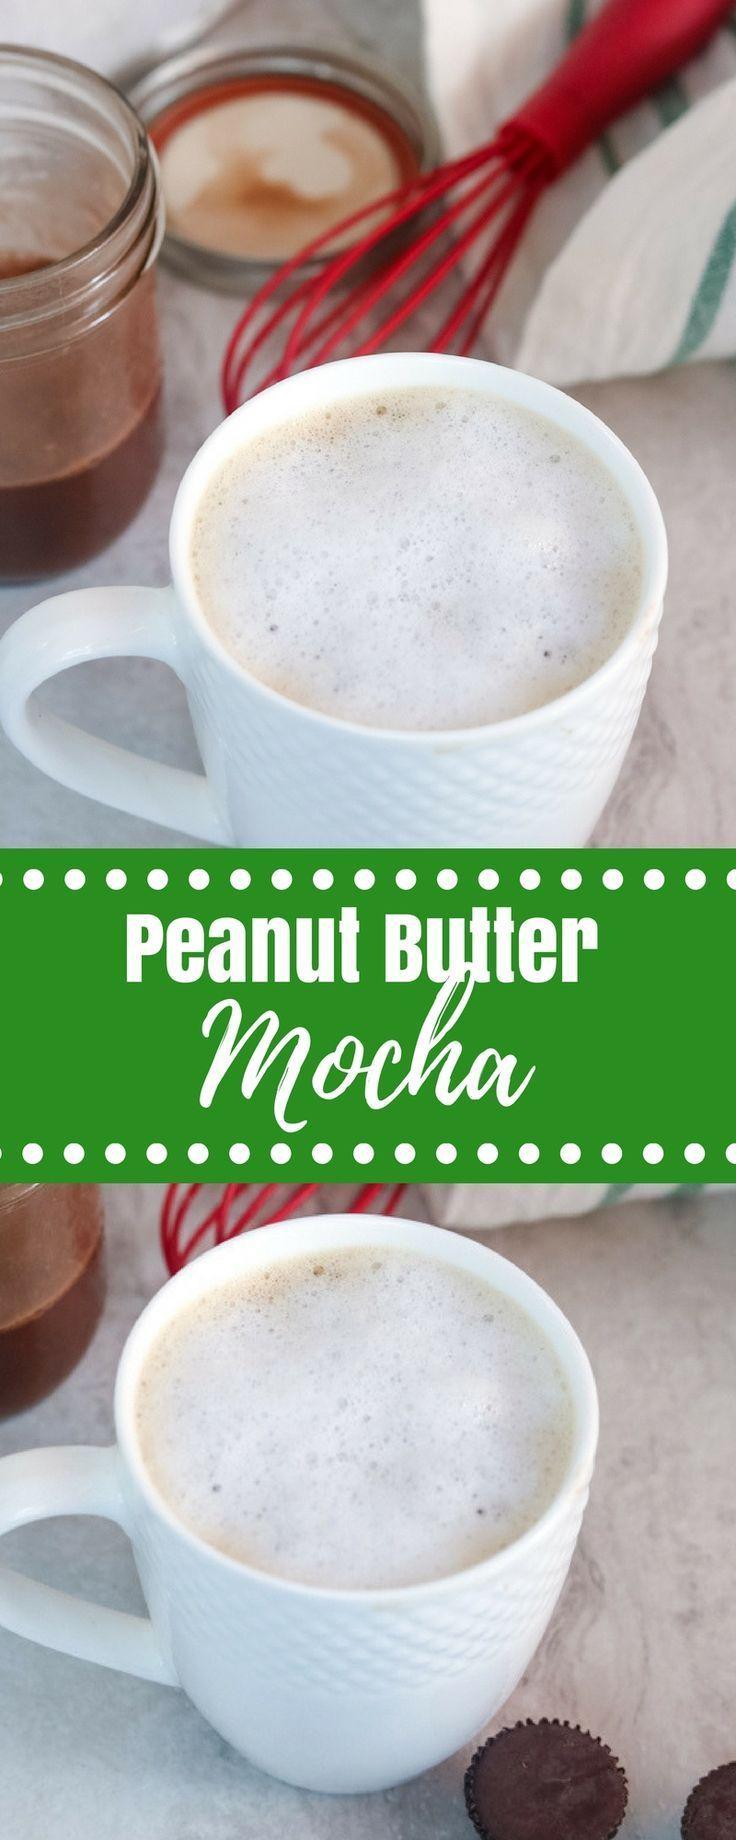 Peanut Butter Coffee A Creamy Dreamy Blend Of Homemade Chocolate Peanut Butter Syrup Espresso And Steamed Peanut Butter Coffee Butter Coffee Homemade Mocha